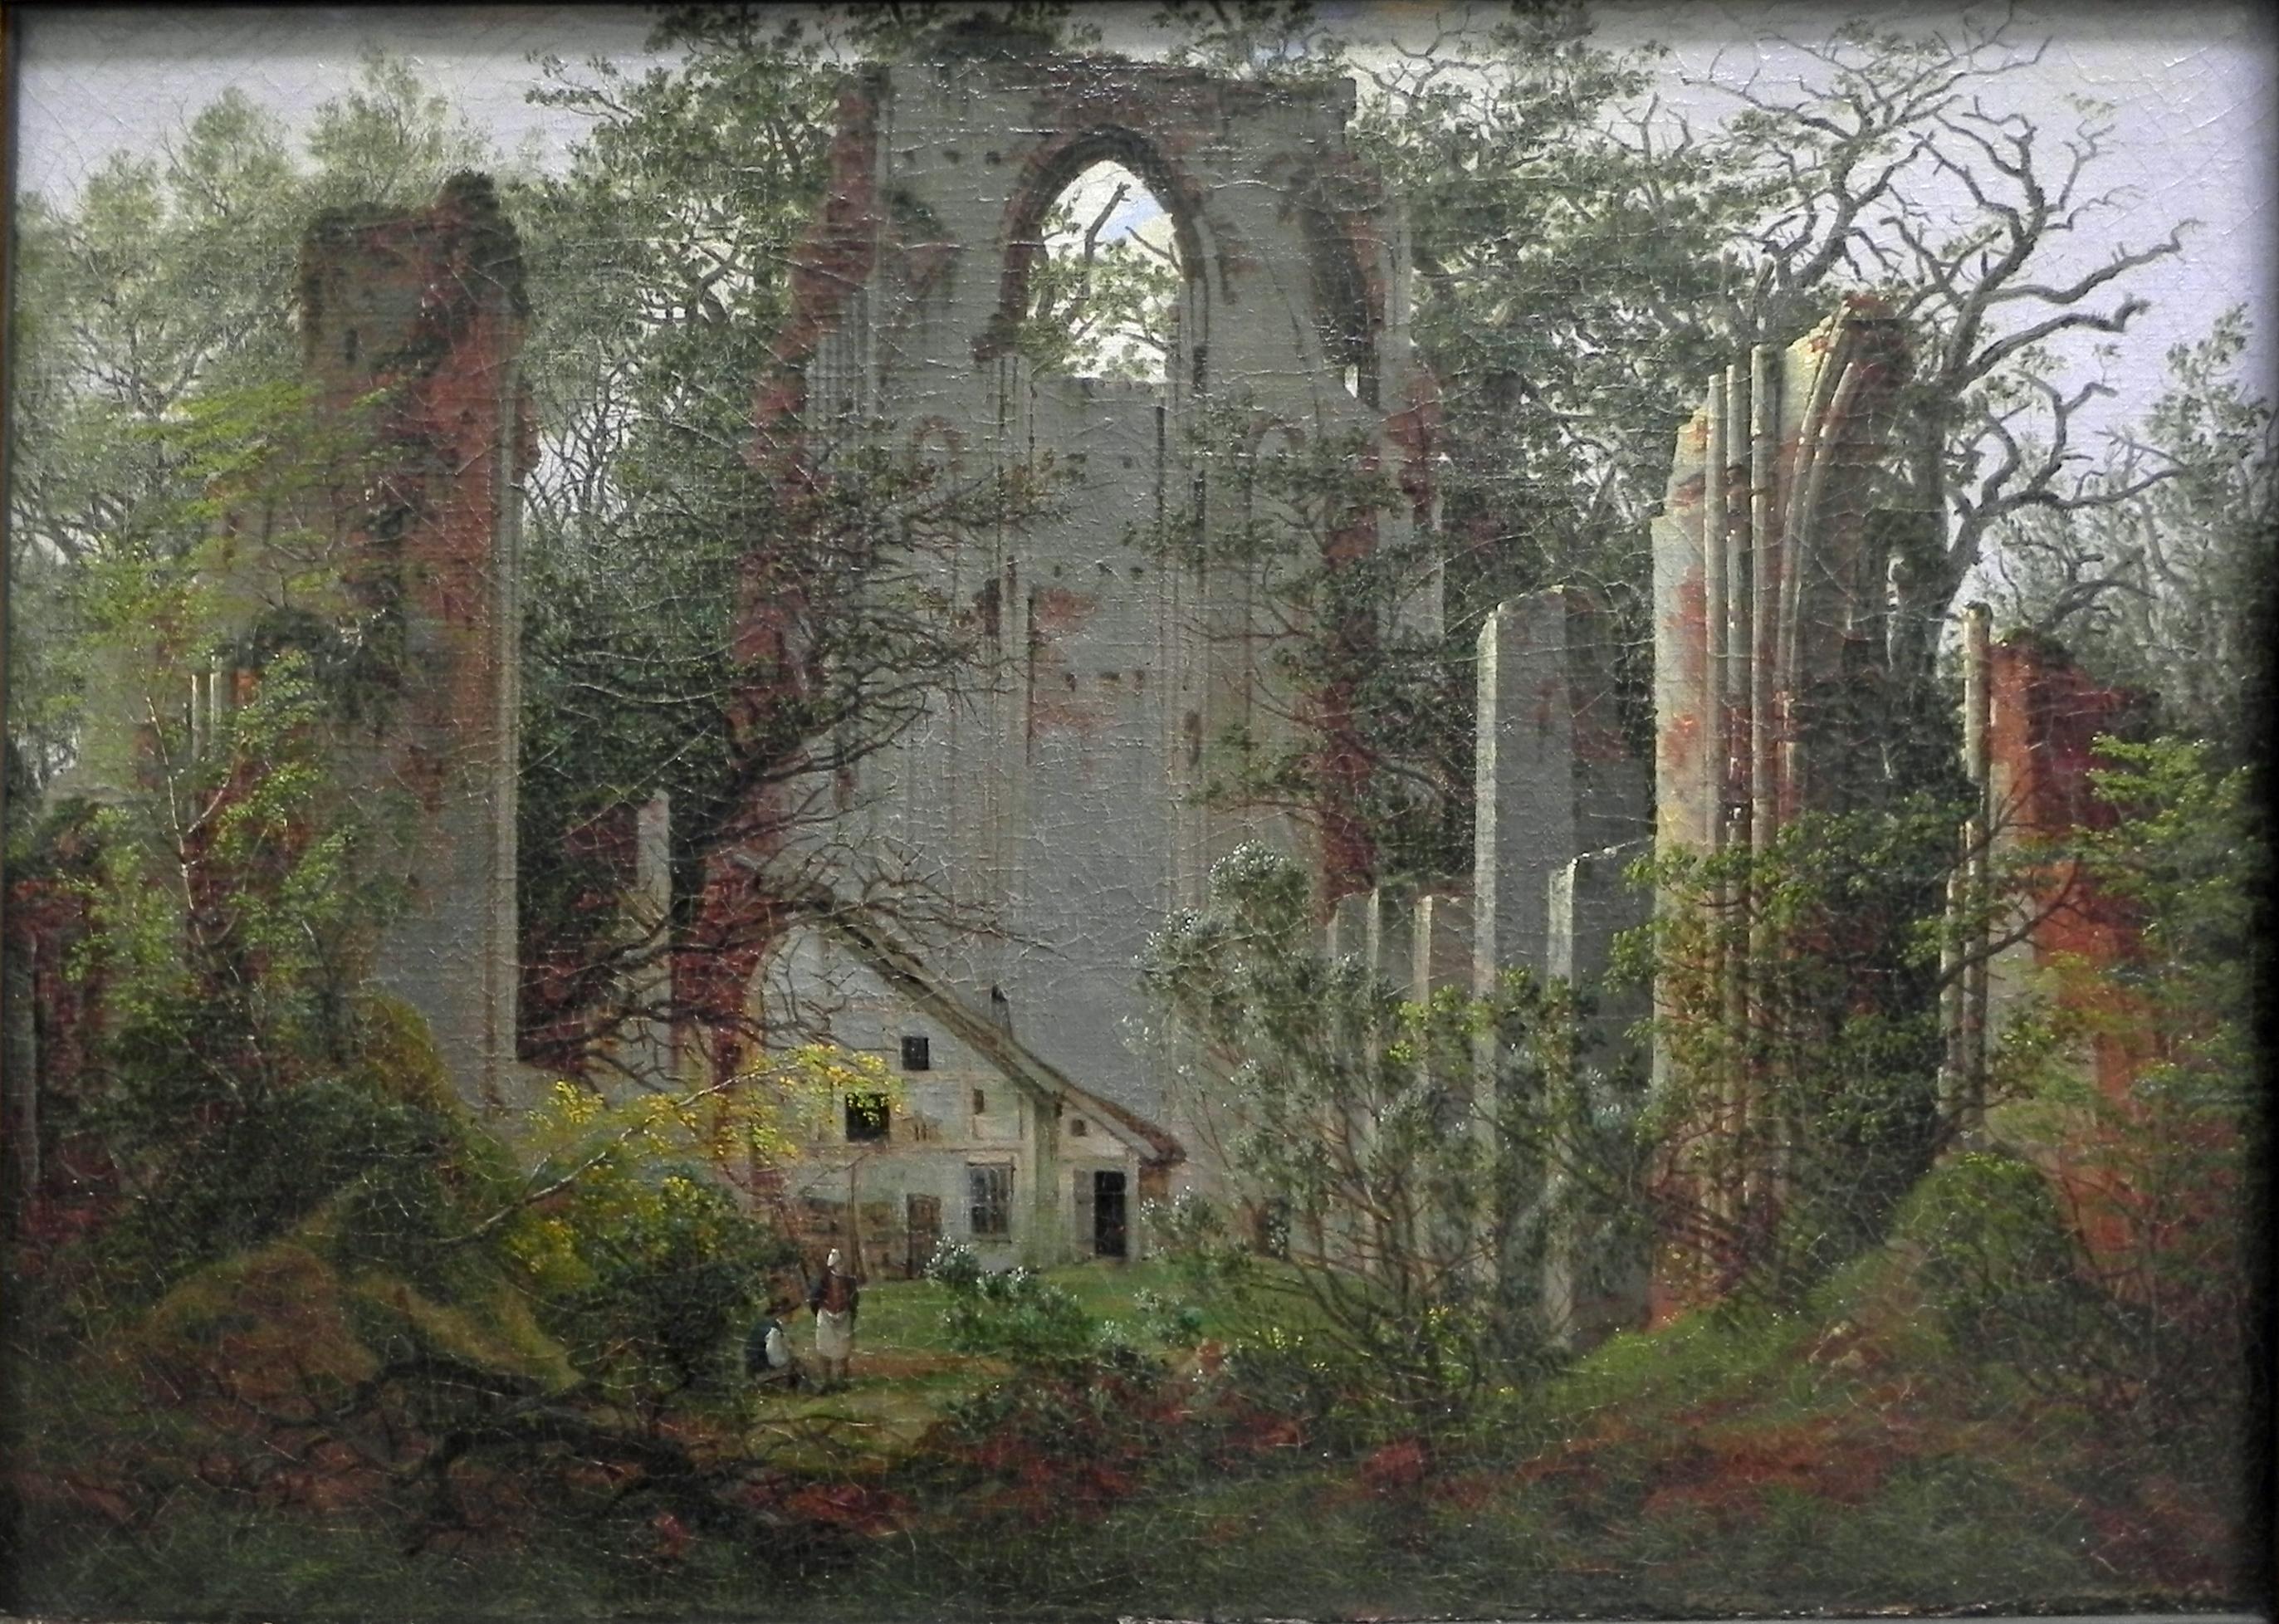 klosterruine eldena bei greifswald 1824 caspar david. Black Bedroom Furniture Sets. Home Design Ideas